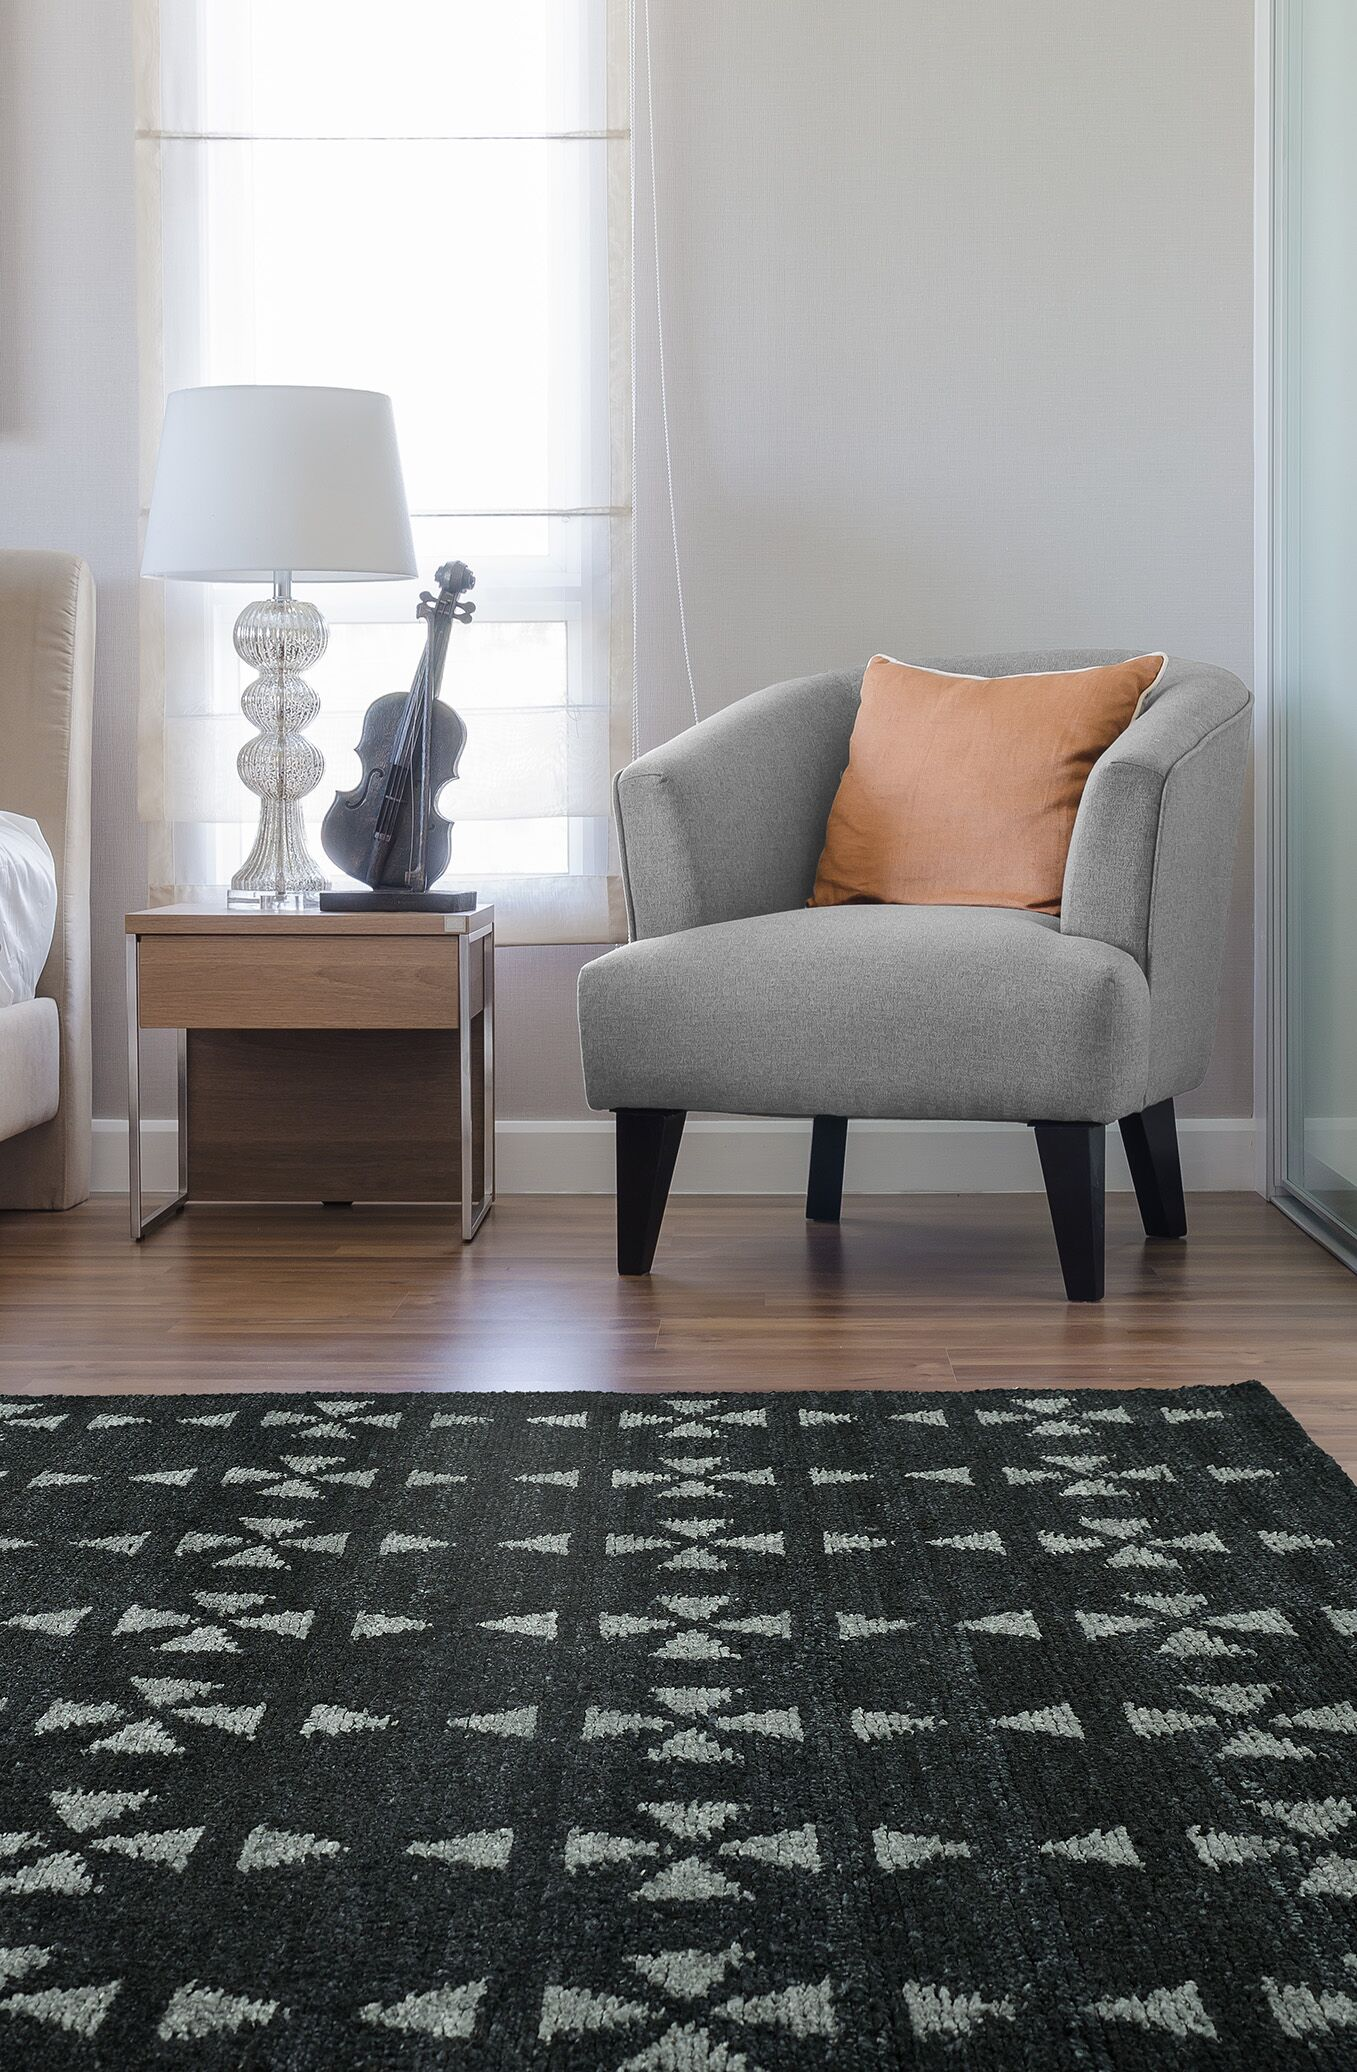 Handmade Charcoal / Grey Area Rug Rug Size: Rectangle 8' x 11'